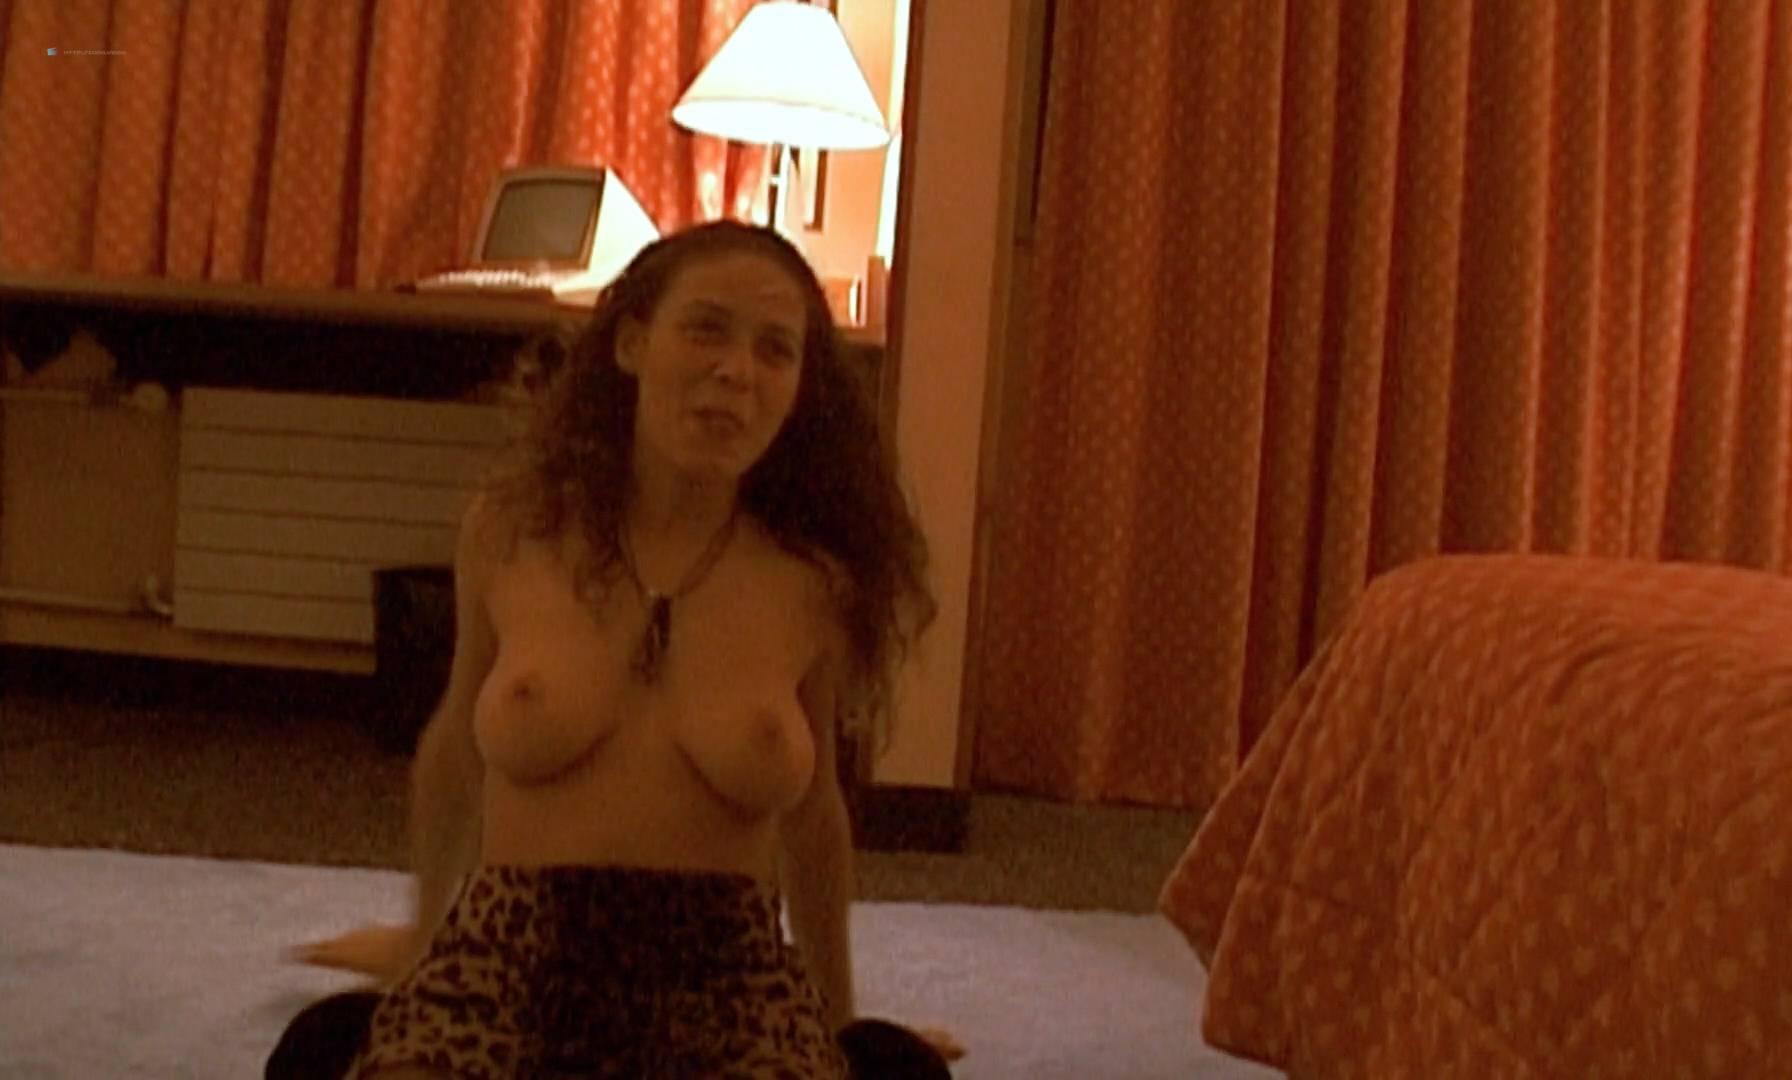 Baise Moi Explicit karen lancaume nude explicit sex raffaëla anderson explicit